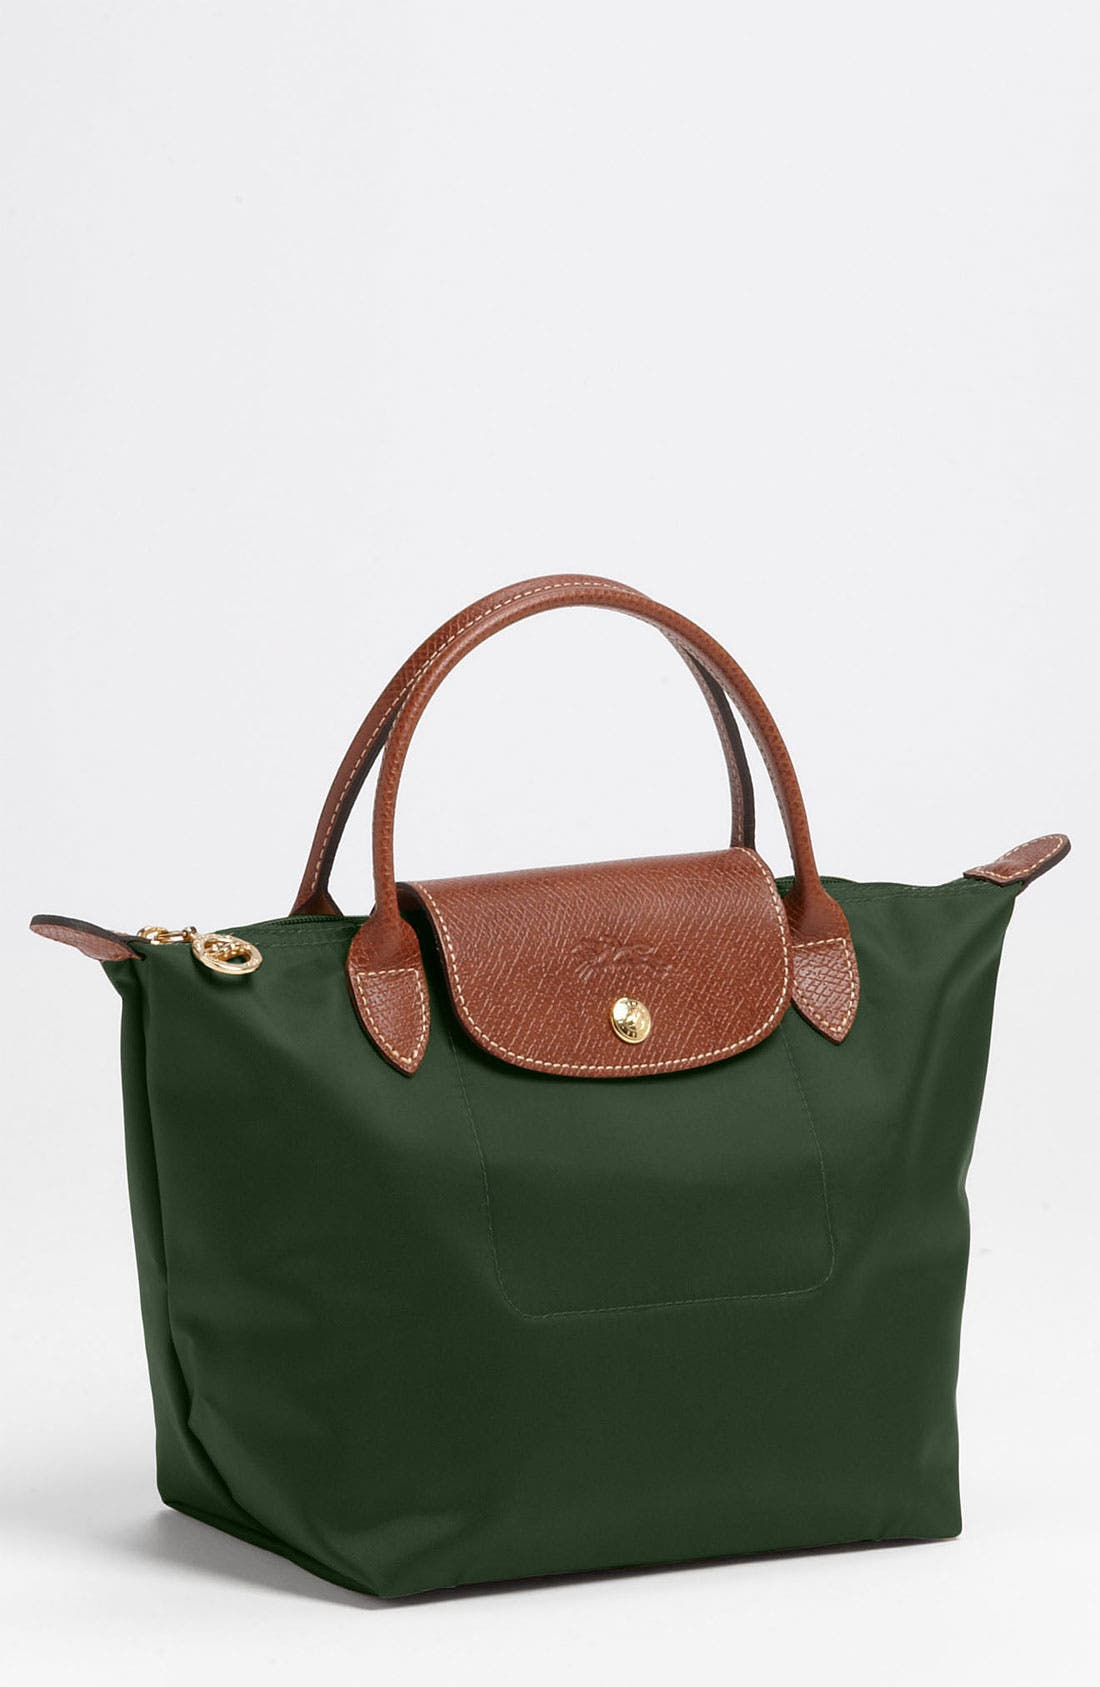 Alternate Image 1 Selected - Longchamp 'Le Pliage - Small' Tote